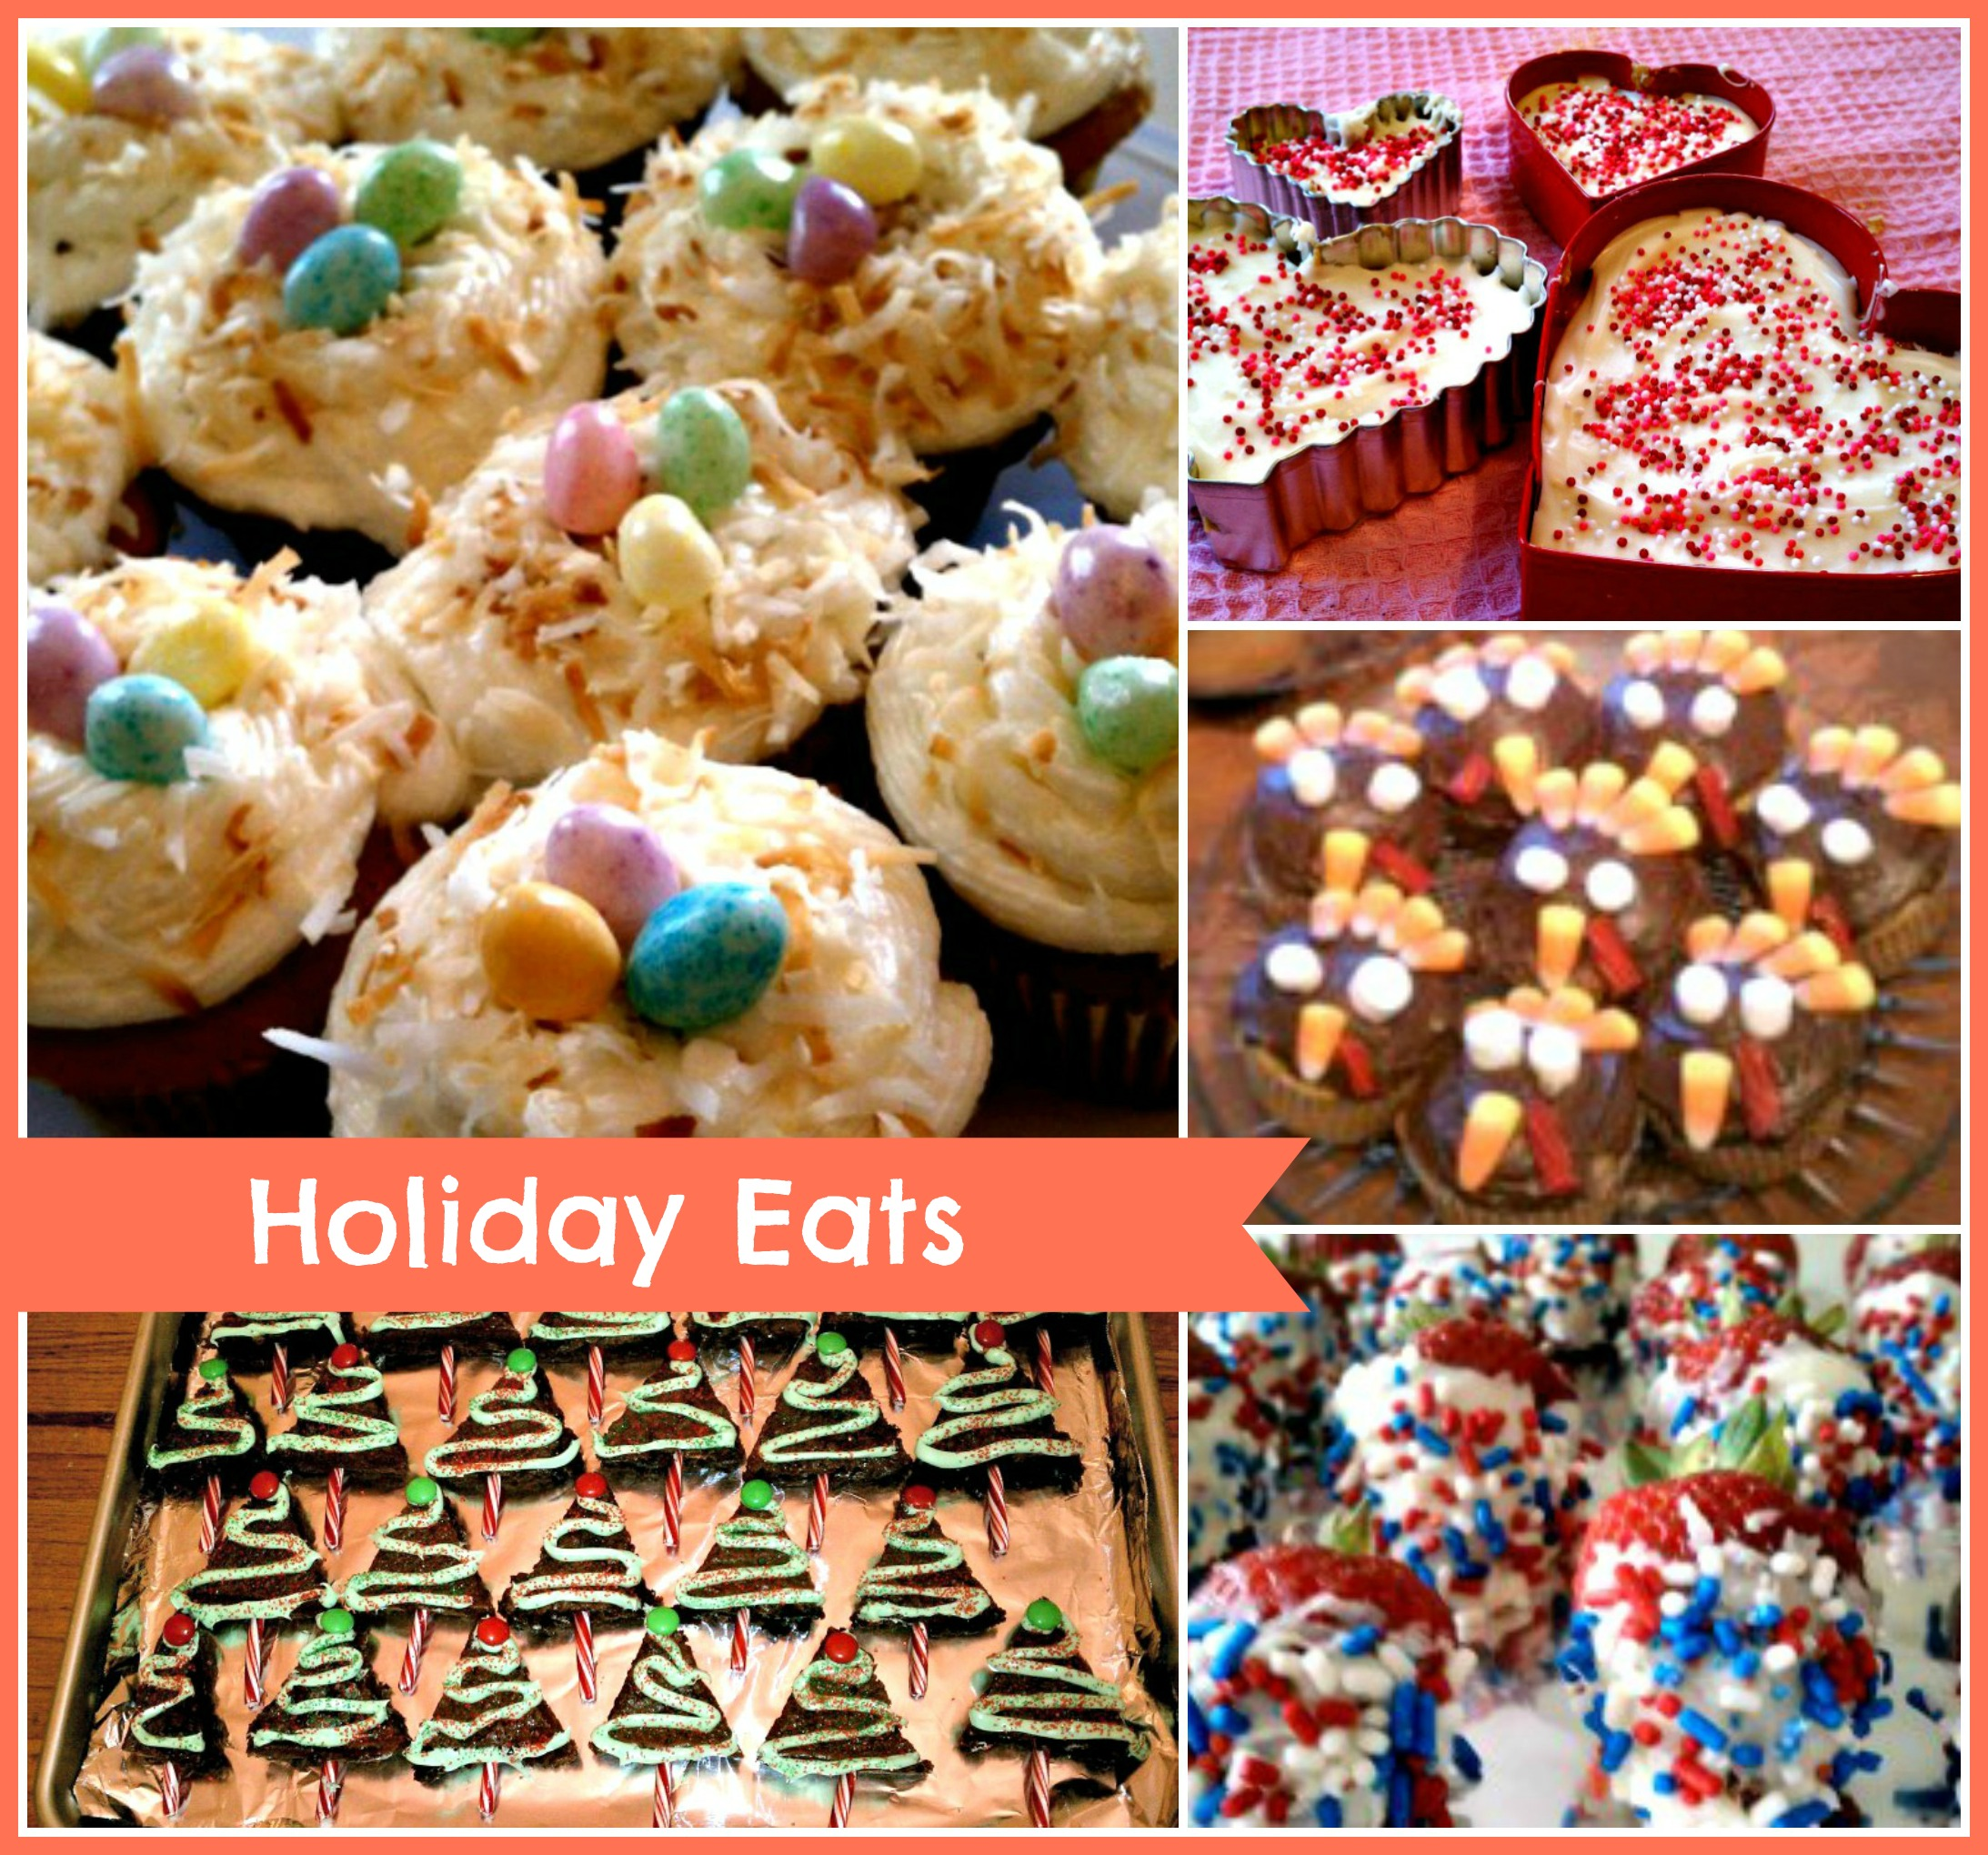 Holiday Eats